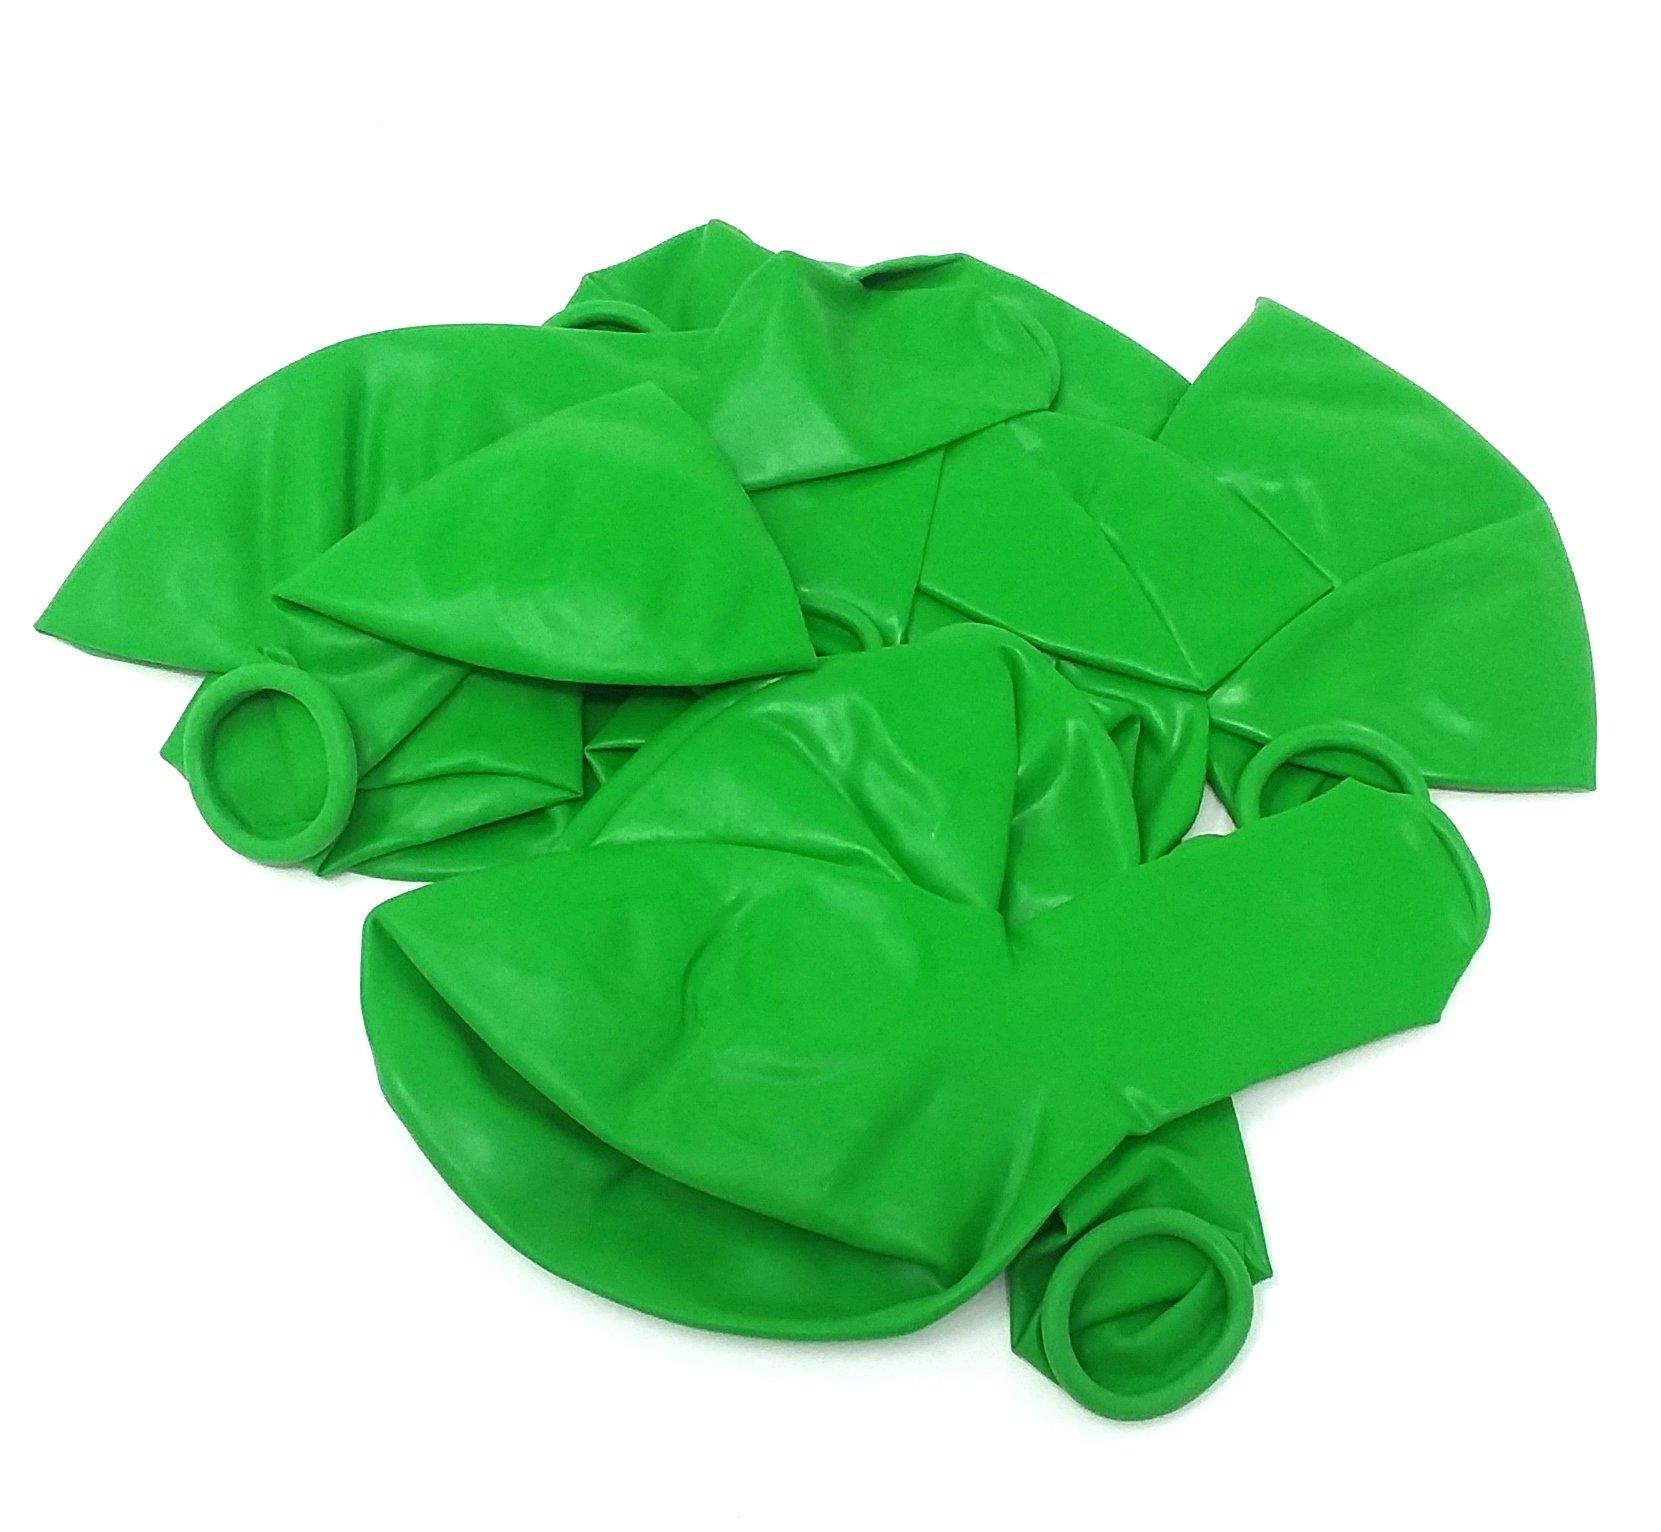 2,000 GREEN 12'' PARTY BALLOONS BULK WHOLESALE LOT